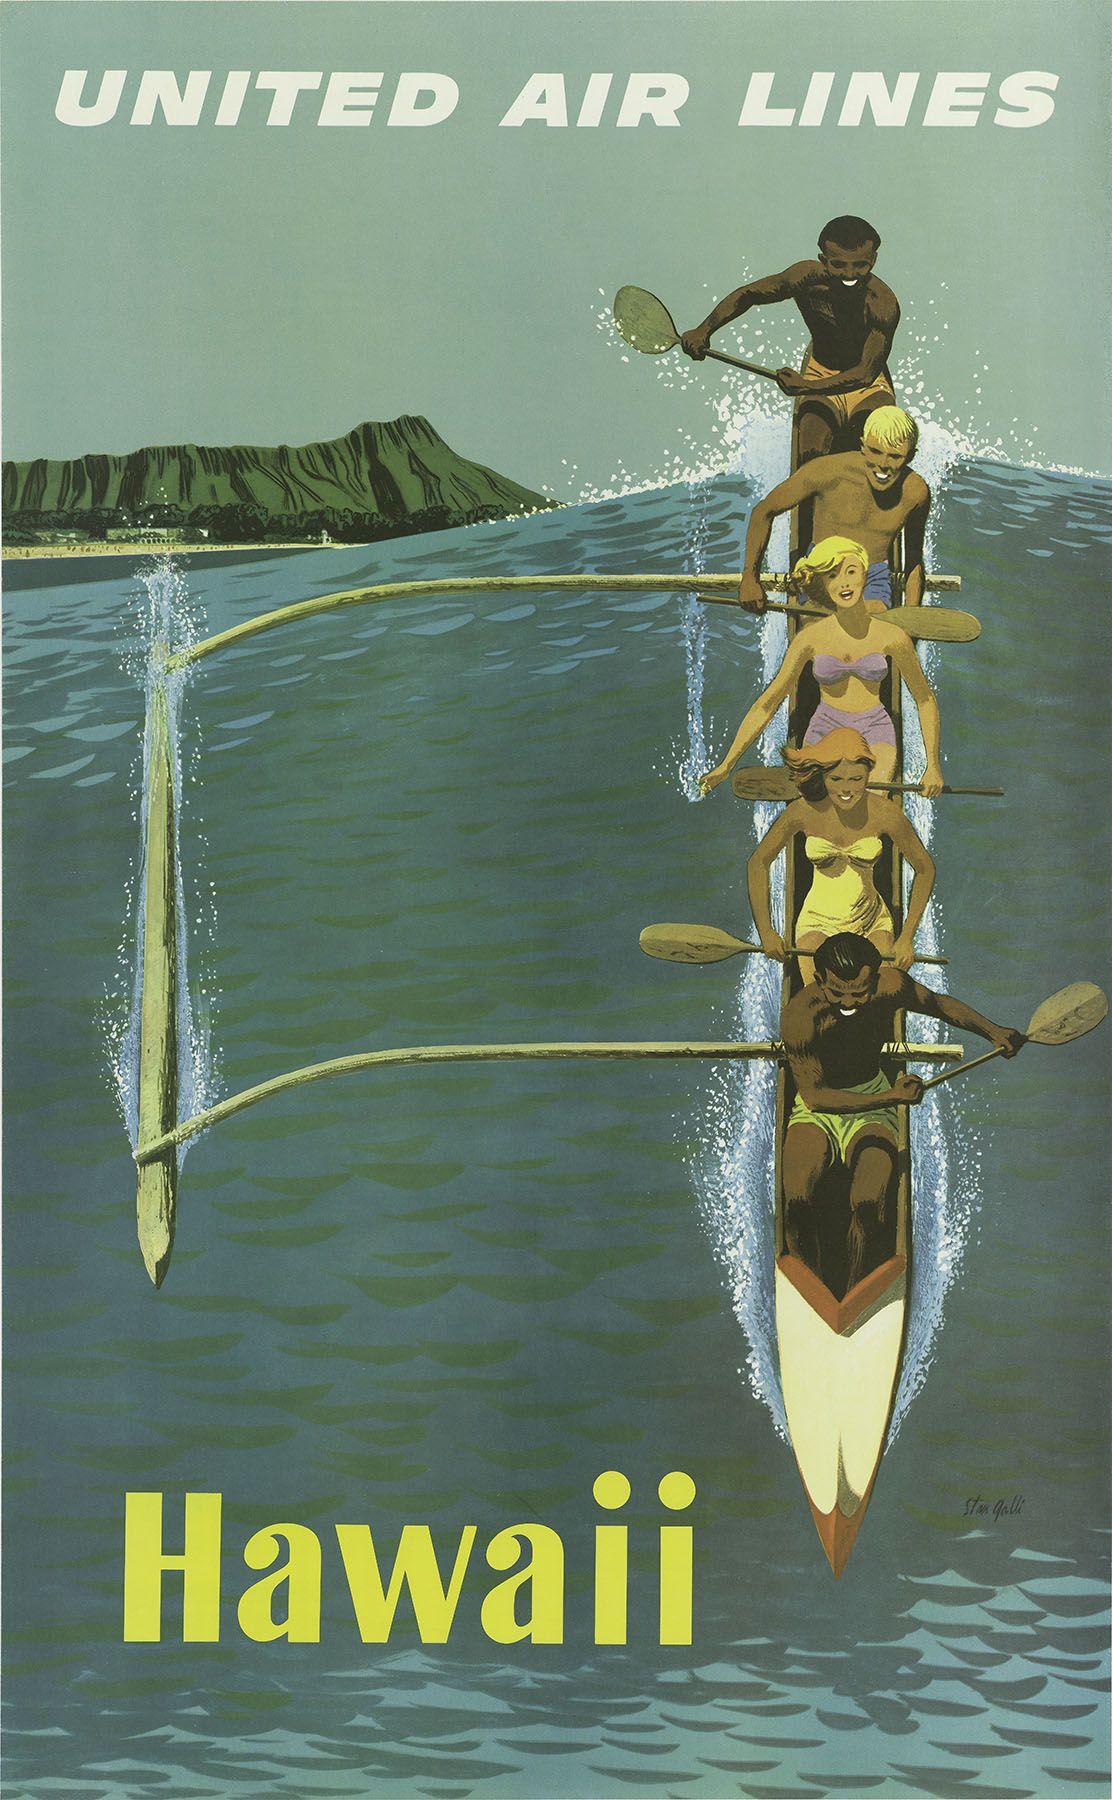 Vintage United Airlines Hawaii Poster